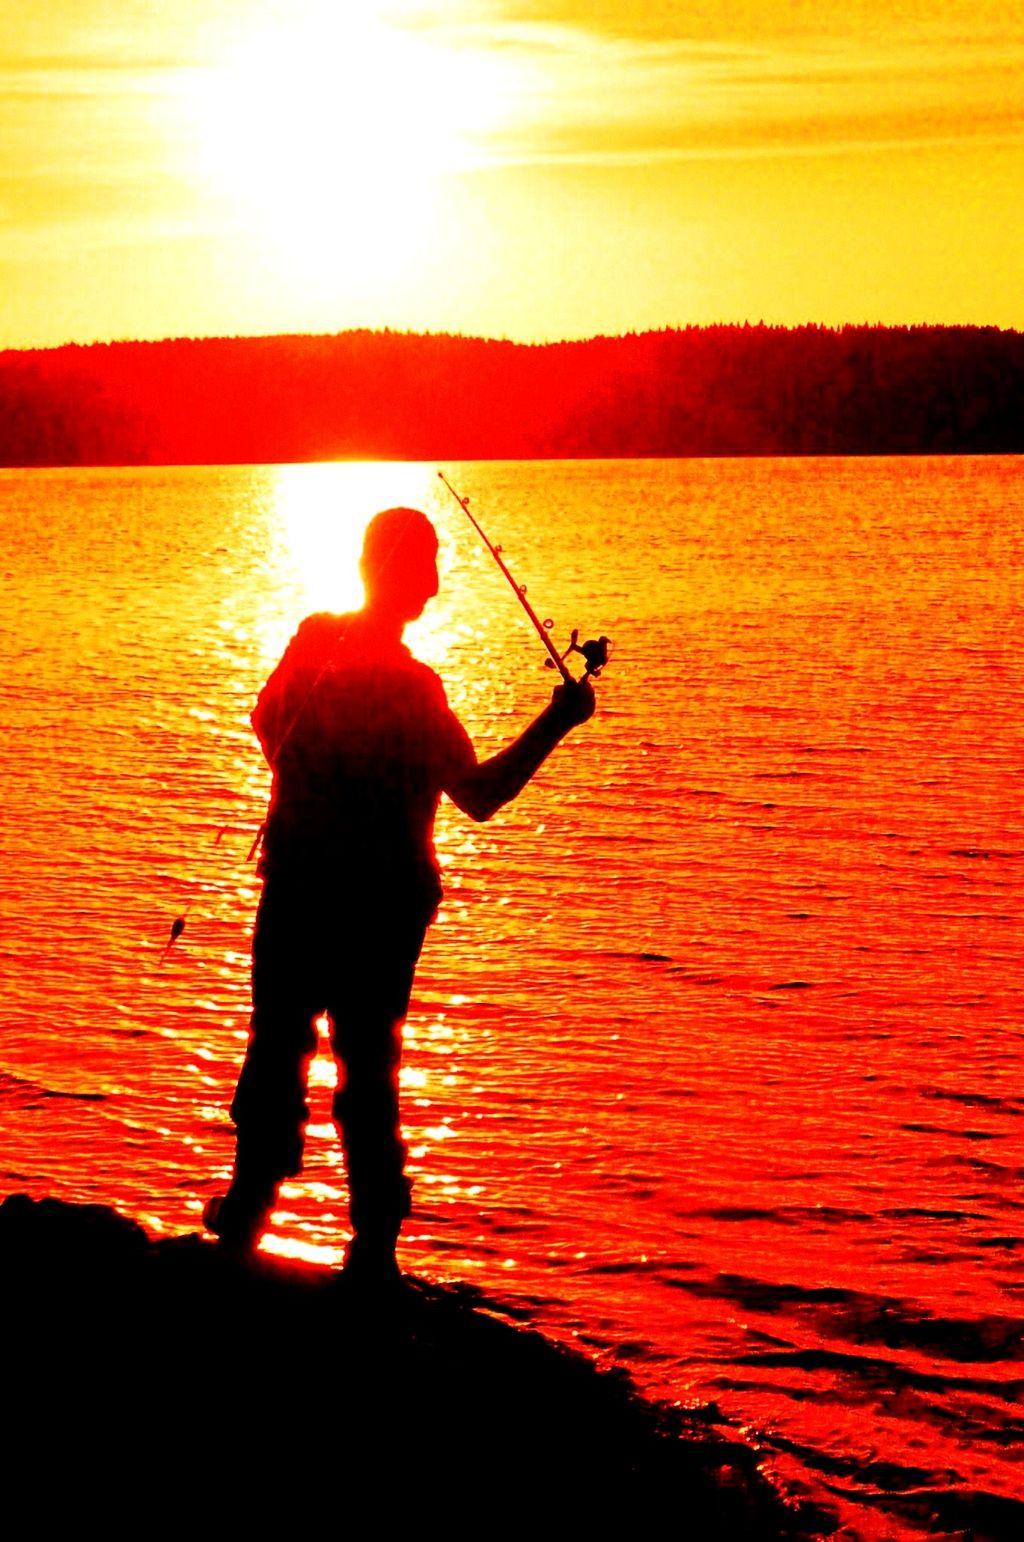 Название: рыбалка на закате.JPG Просмотров: 248  Размер: 253.8 Кб